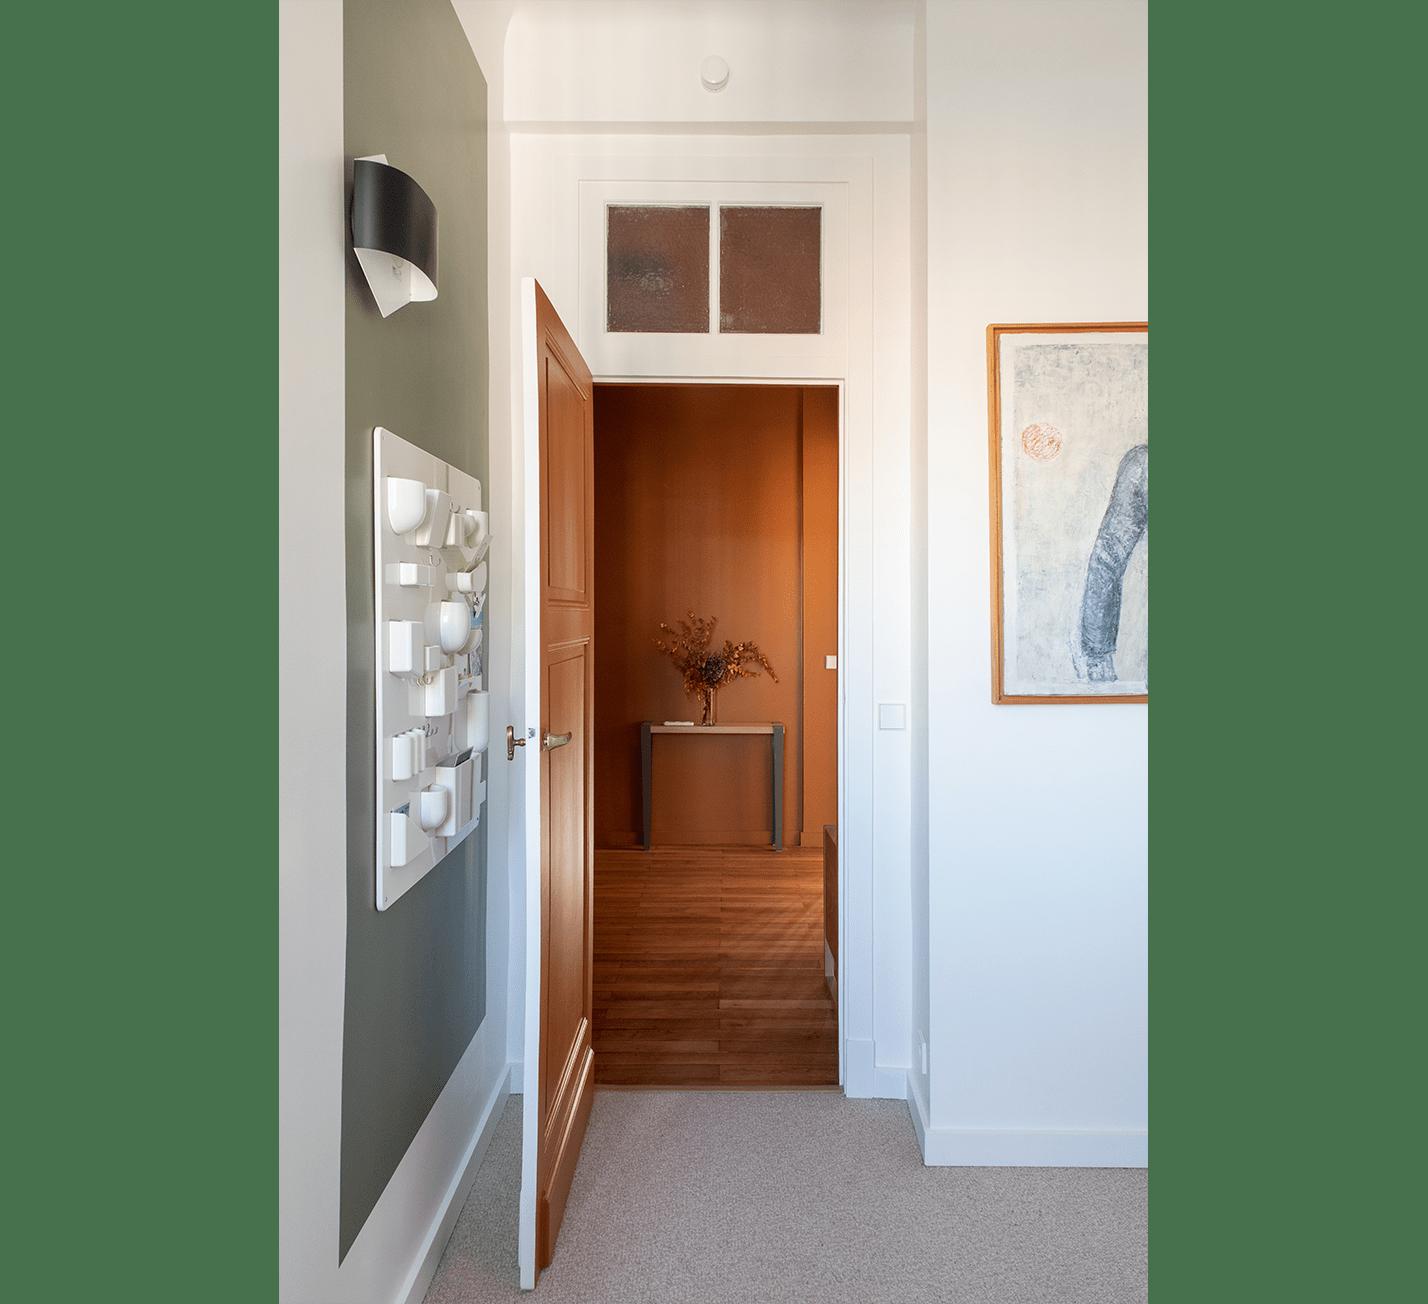 Projet-Emile-Atelier-Steve-Pauline-Borgia-Architecte-interieur-12-min